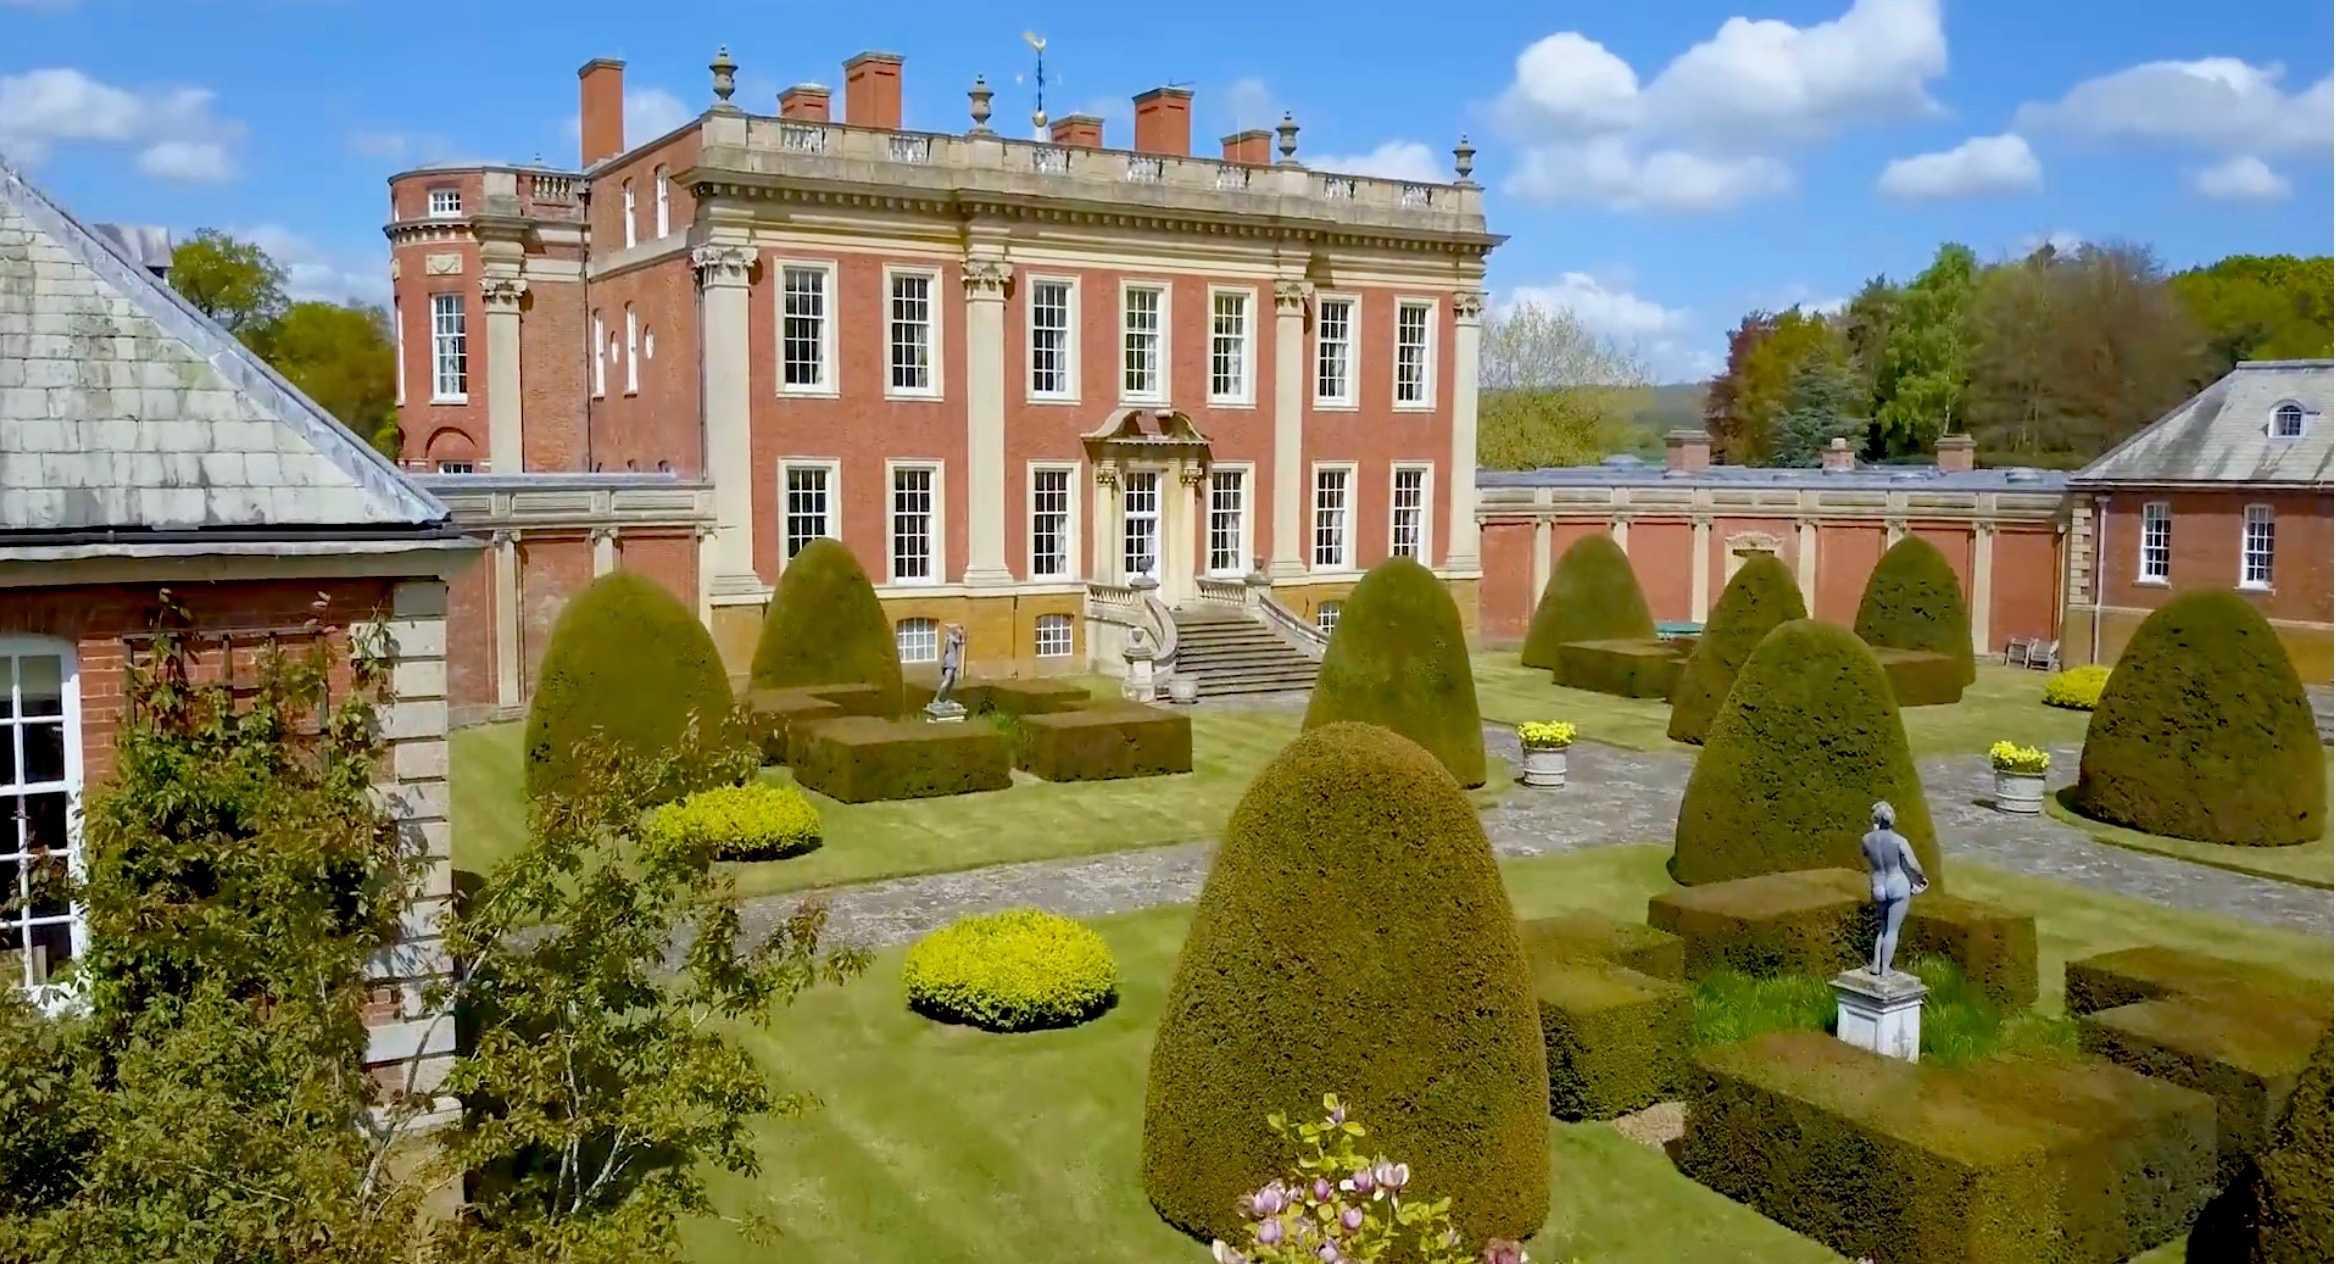 Cottesbrooke Hall, Northamptonshire, England